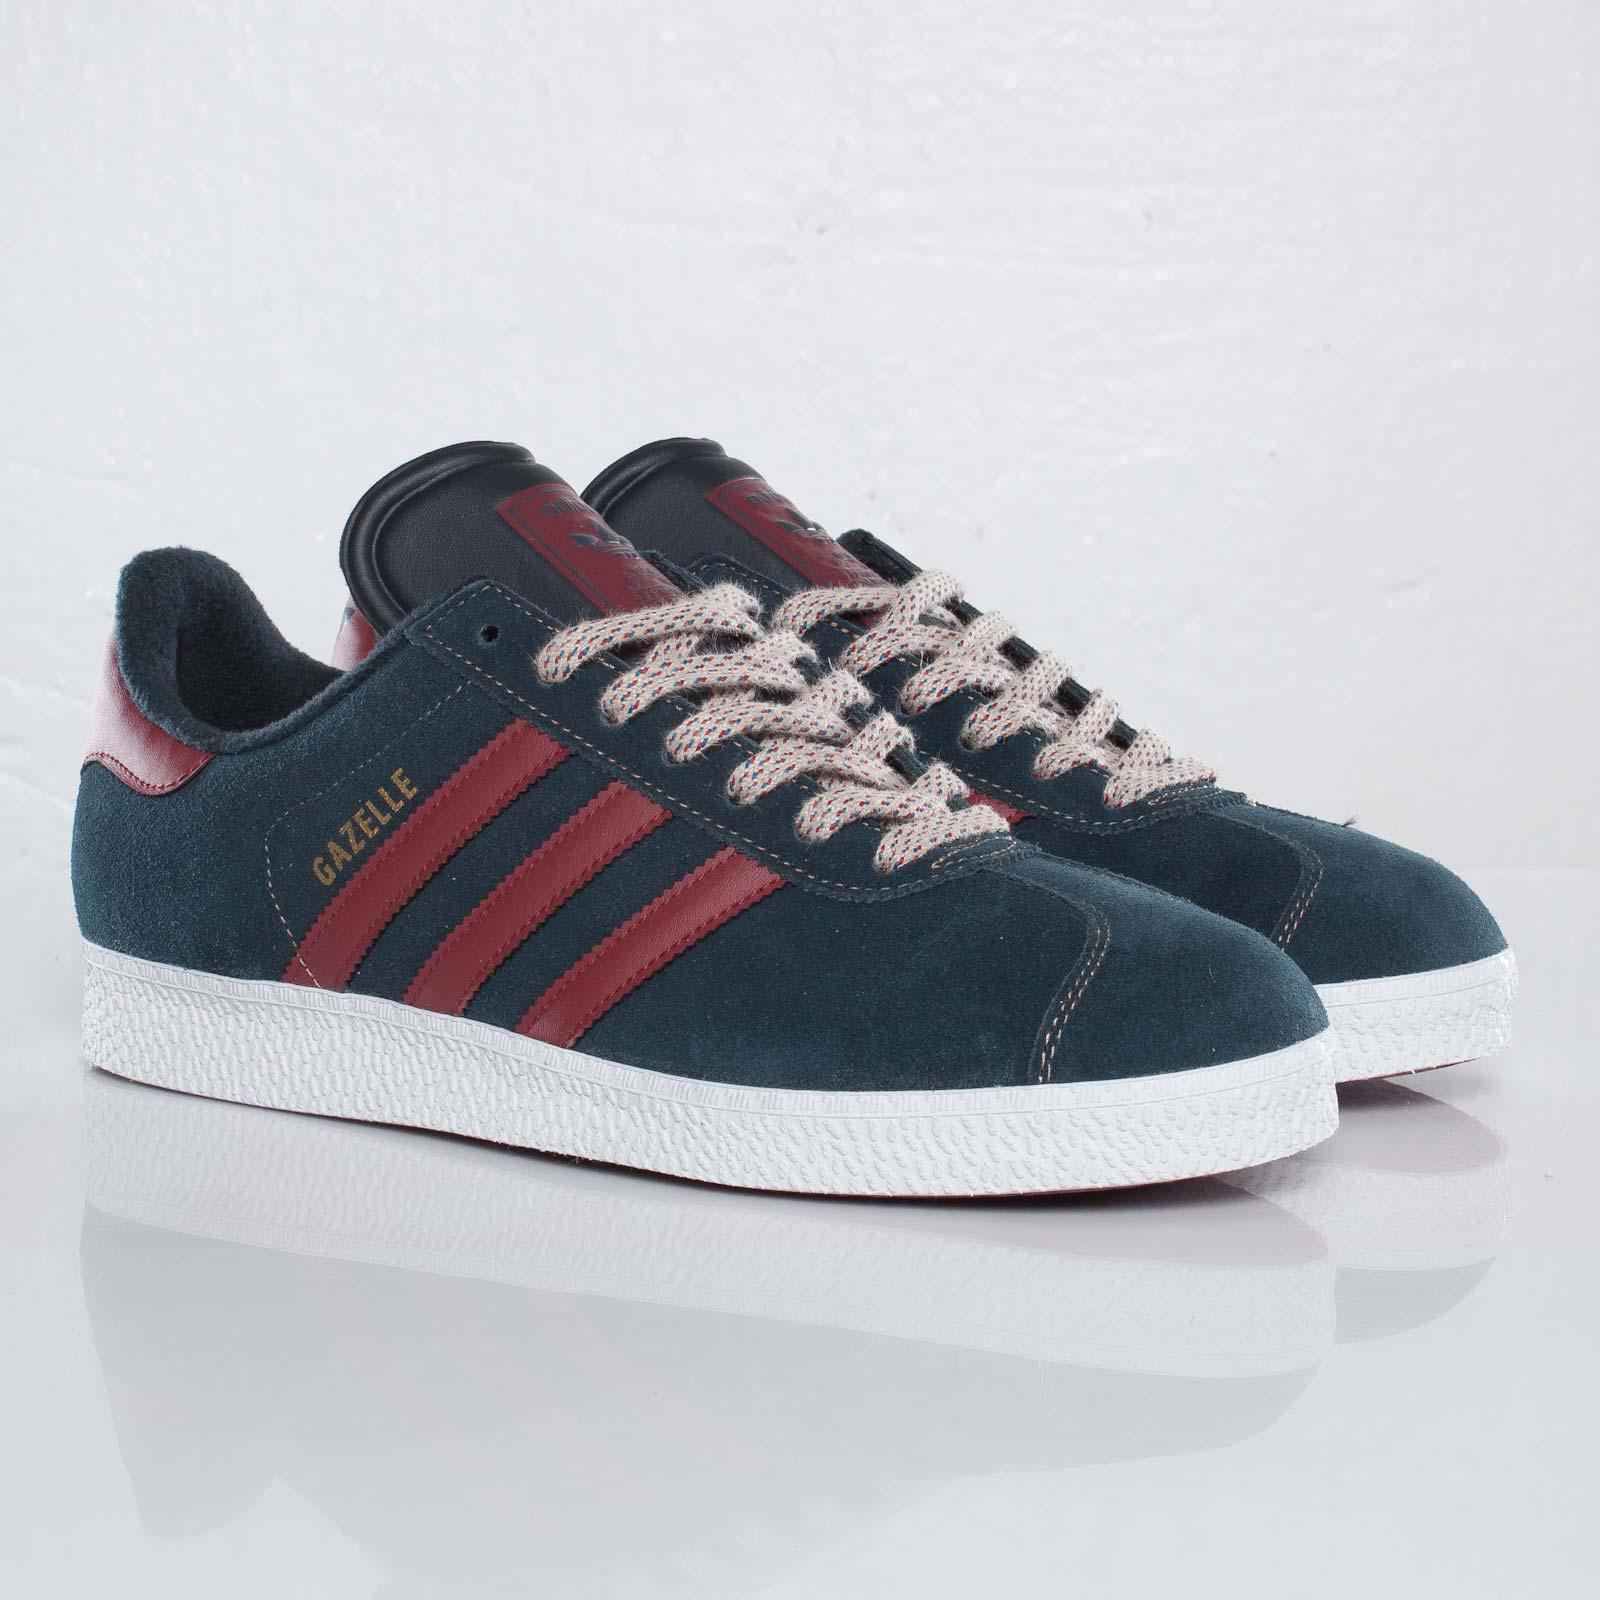 4bbf6682d0ee adidas Gazelle ll - G63208 - Sneakersnstuff